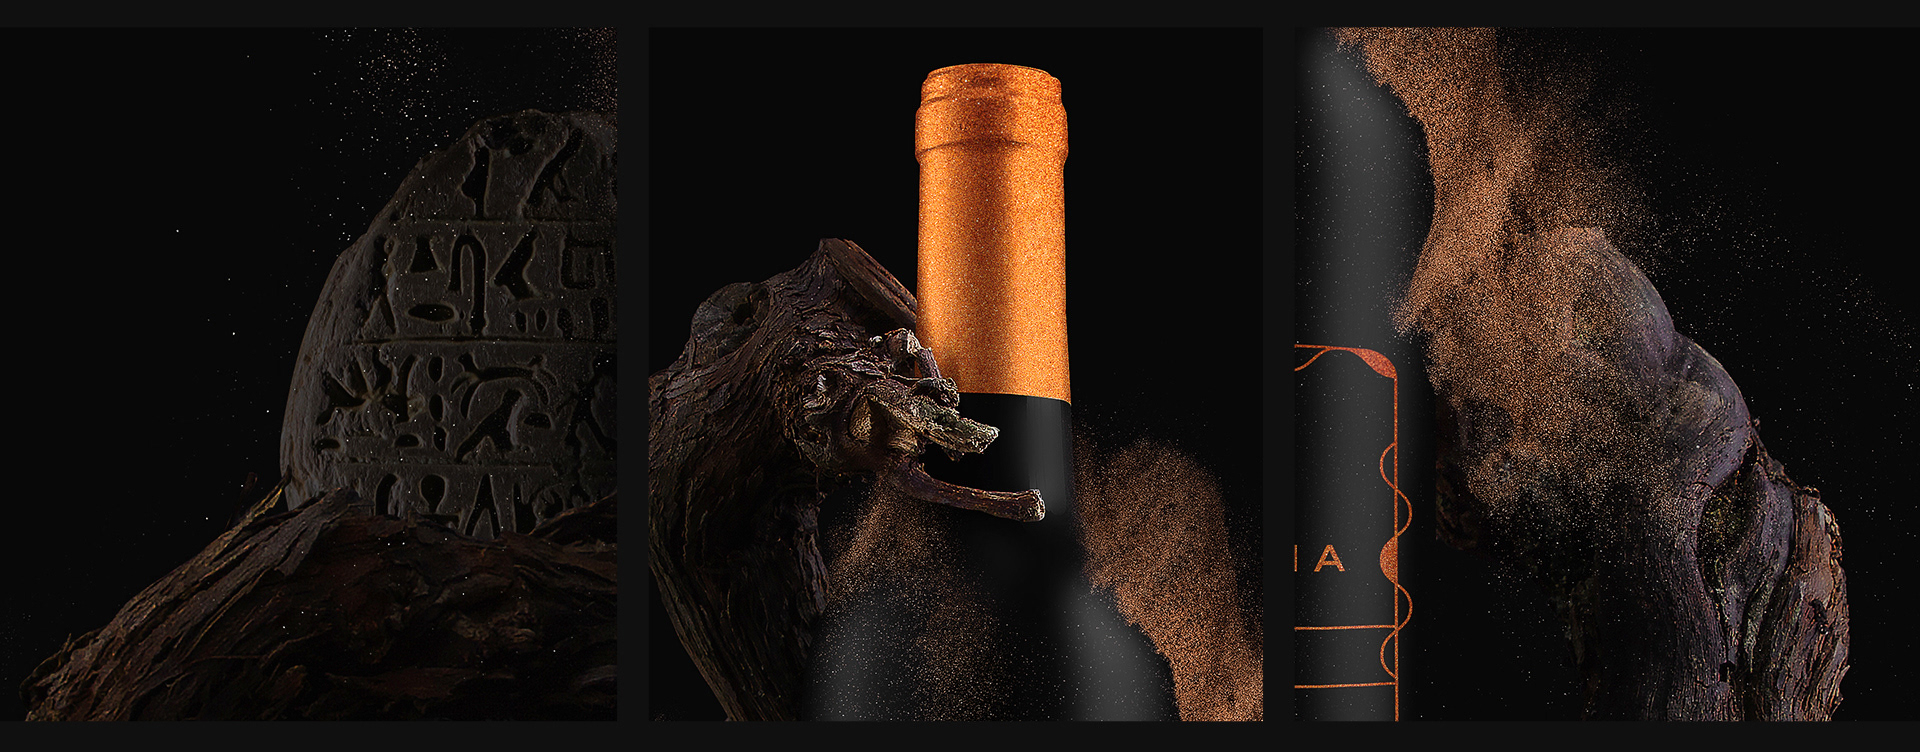 Luiz Arthuso Design Studio - Sibuna - Winery8.jpg